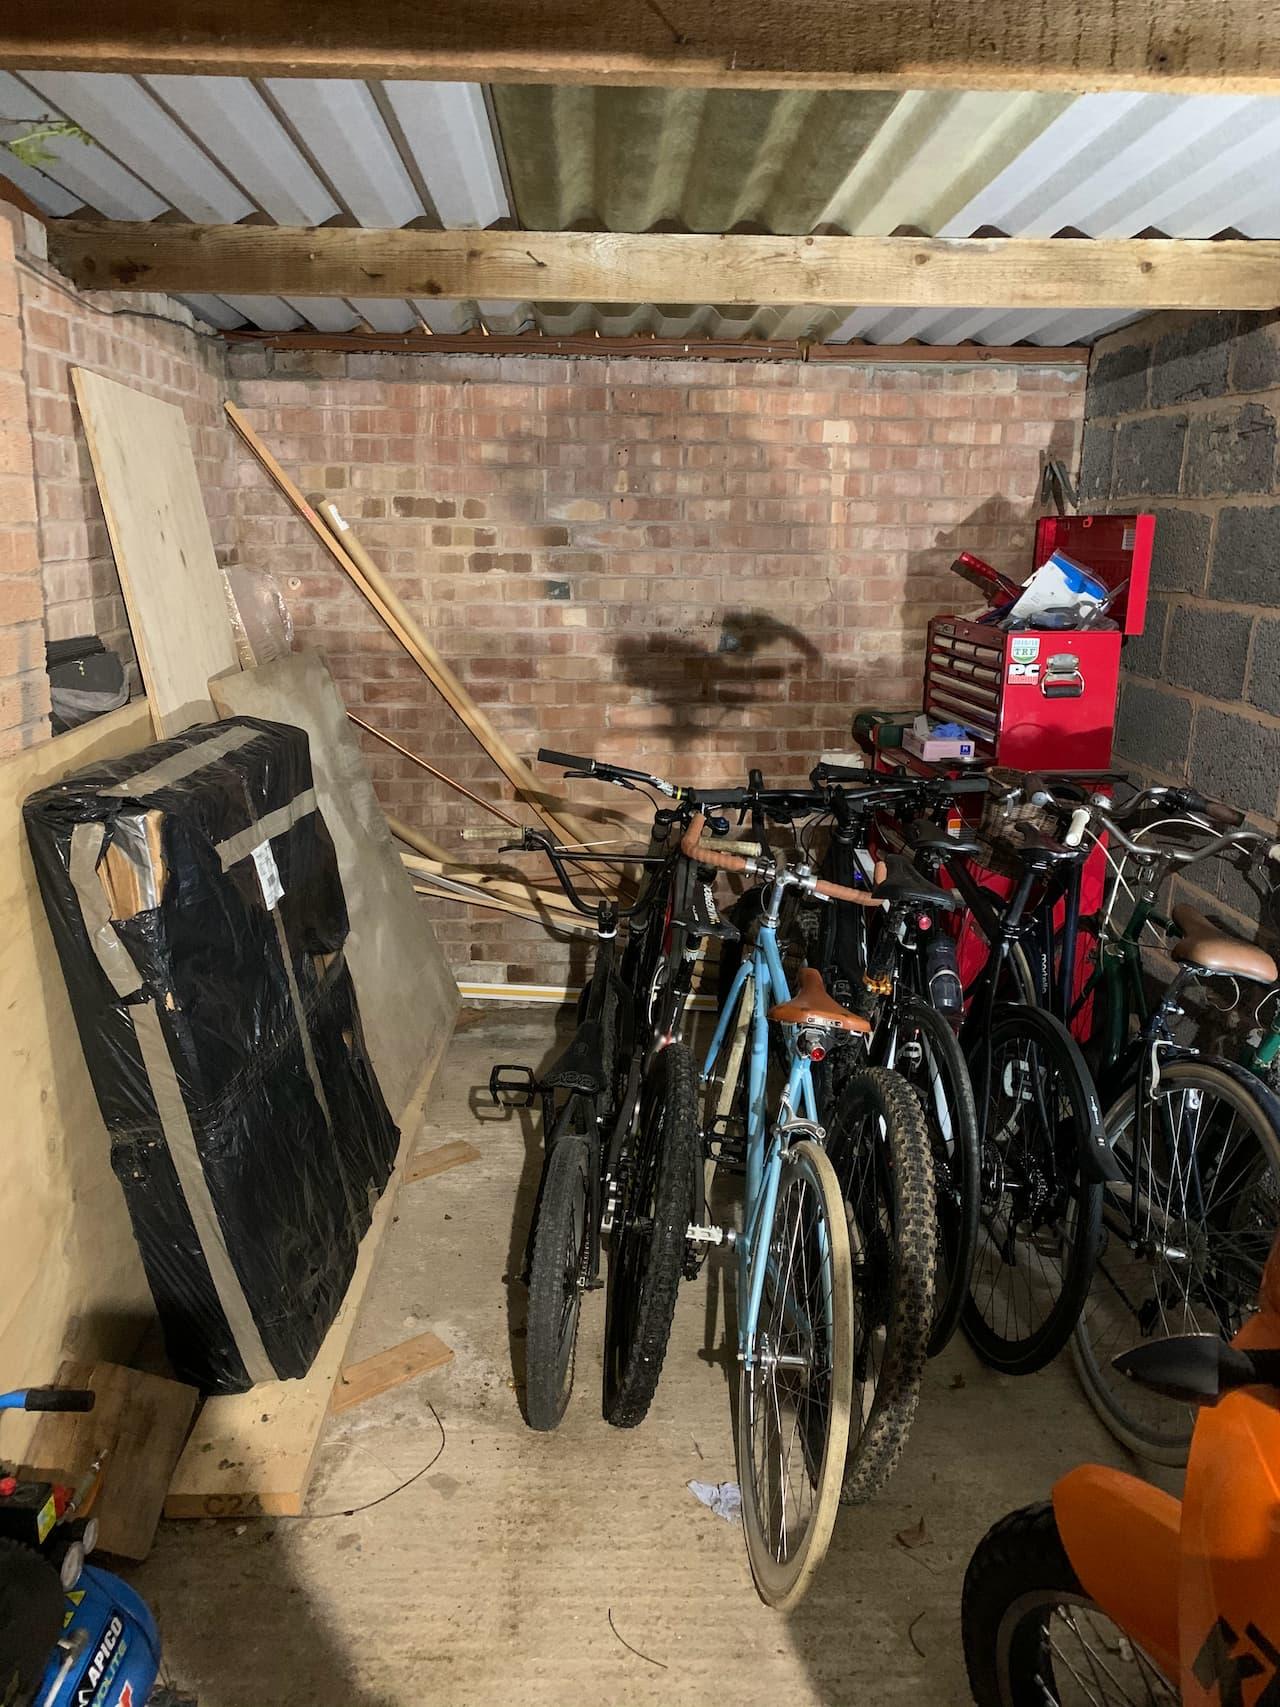 An untidy garage full of bikes